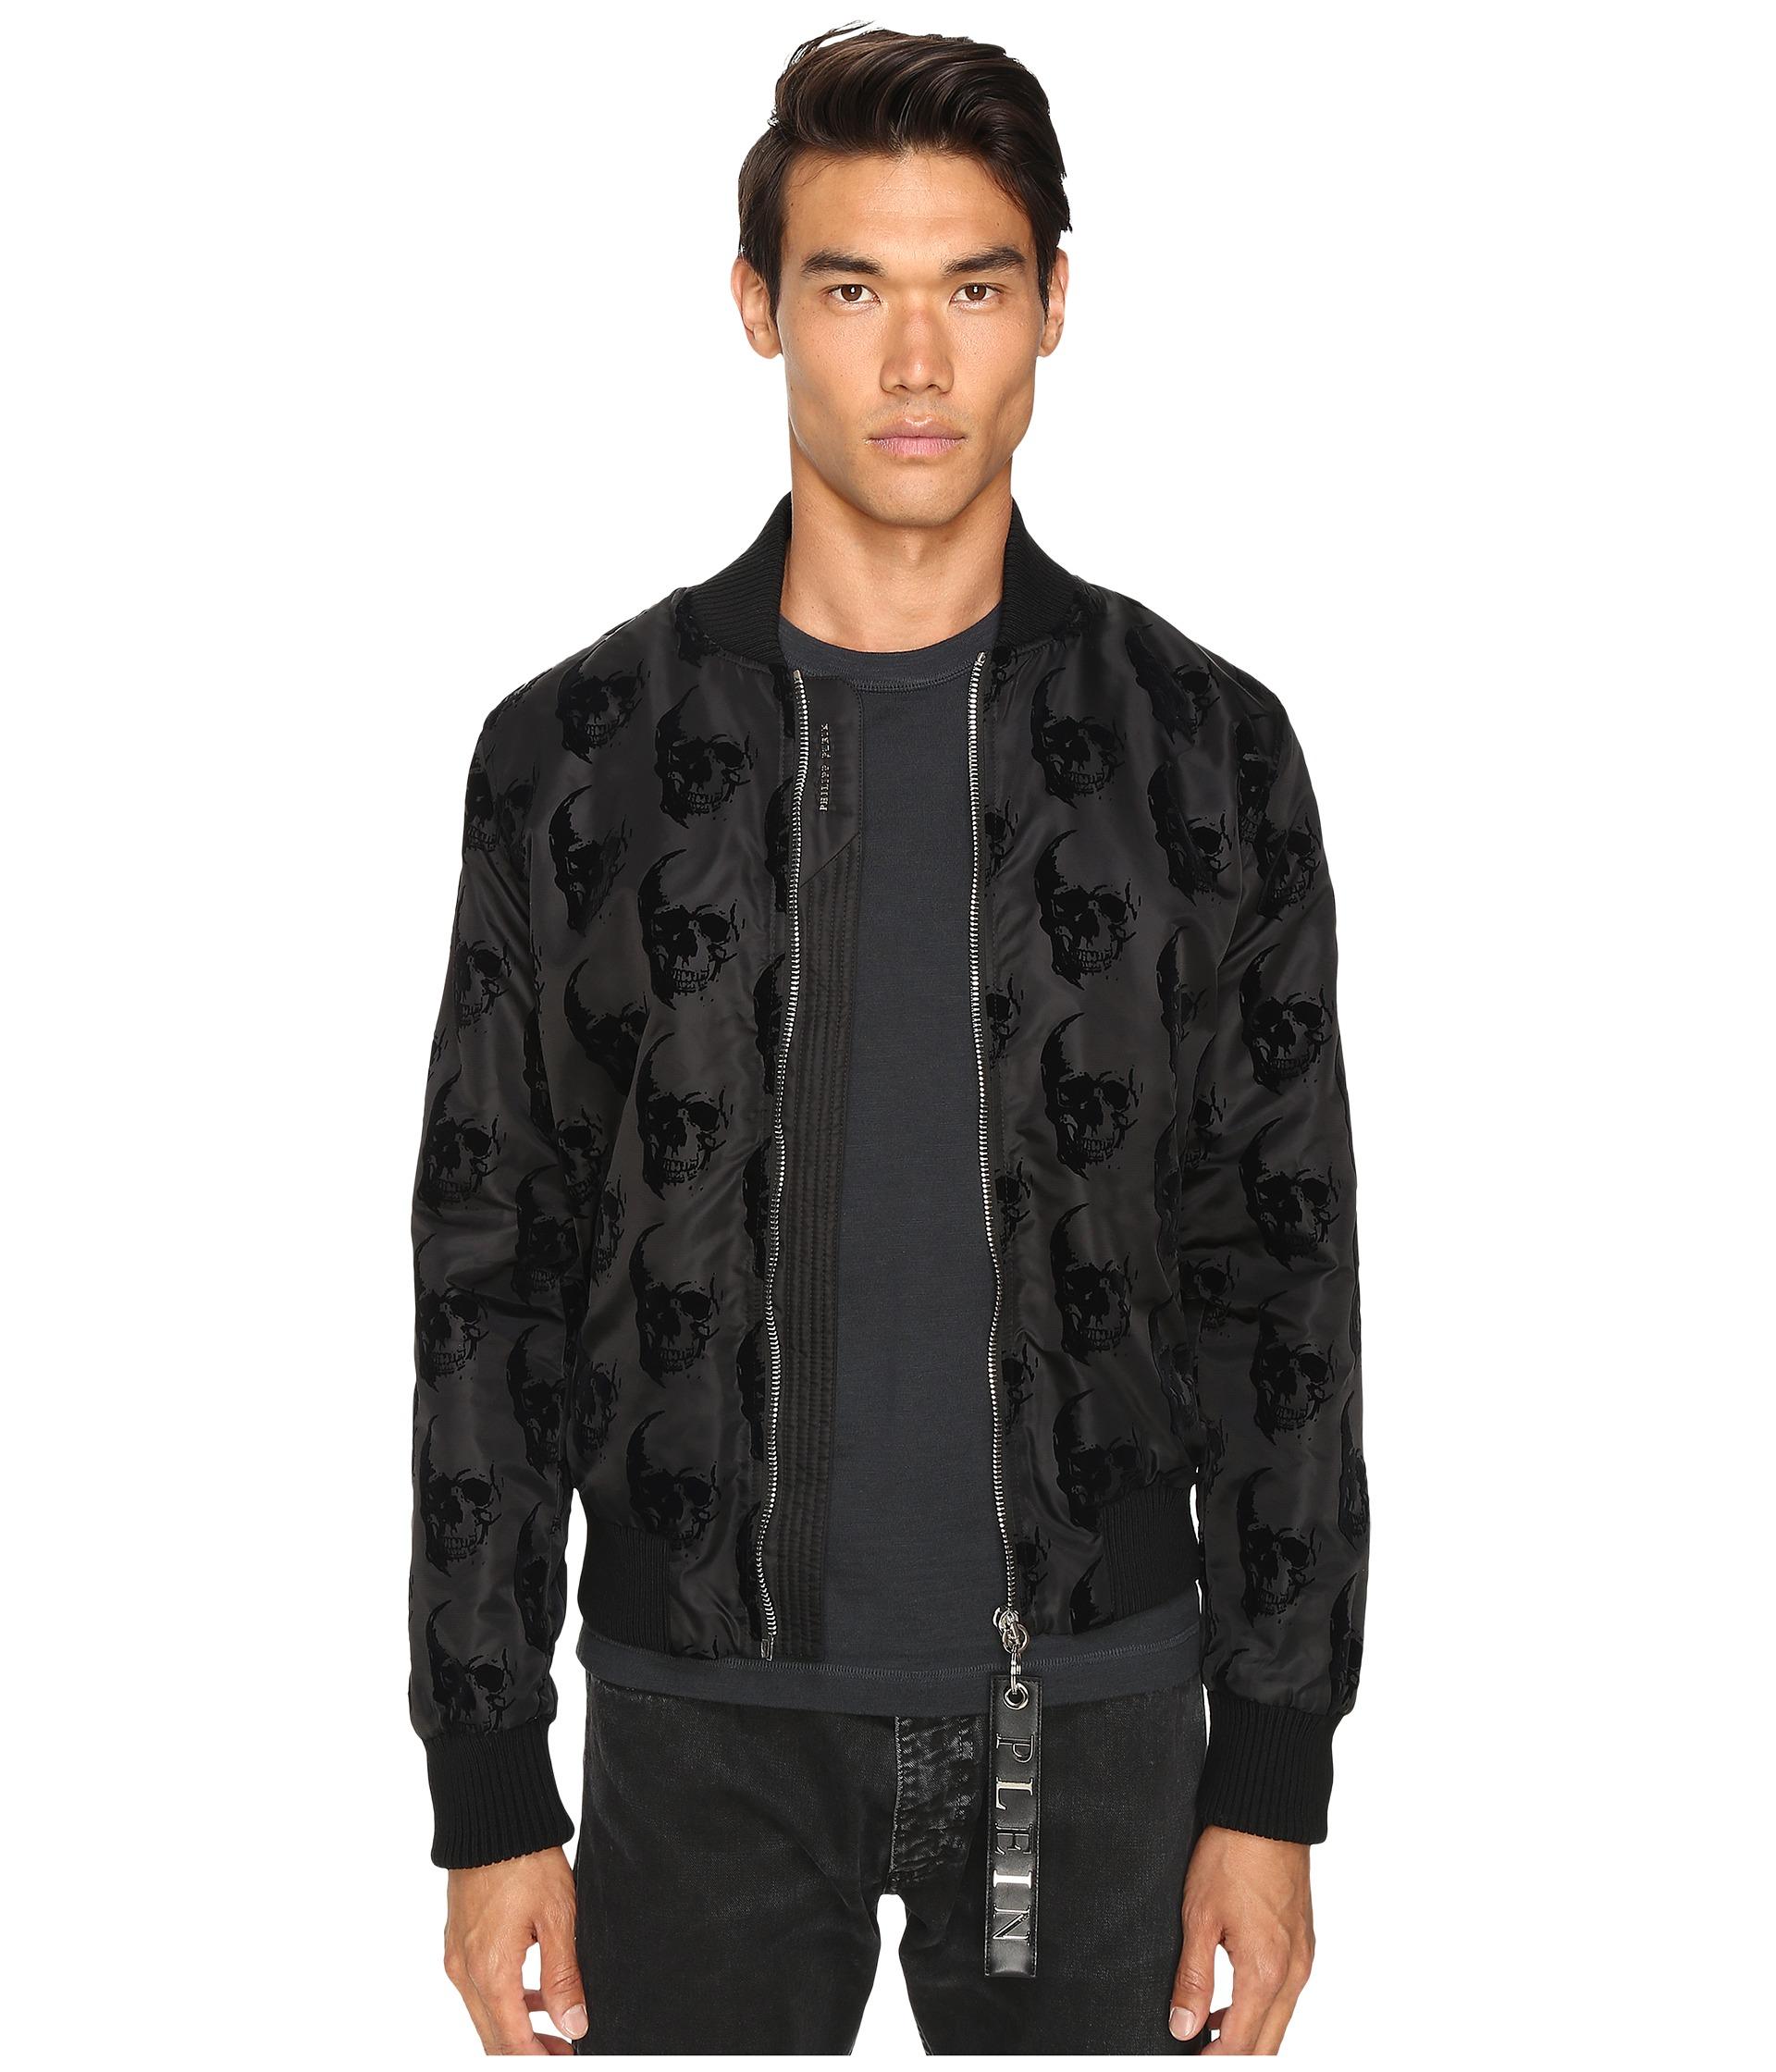 philipp plein think sweat jacket black free shipping both ways. Black Bedroom Furniture Sets. Home Design Ideas